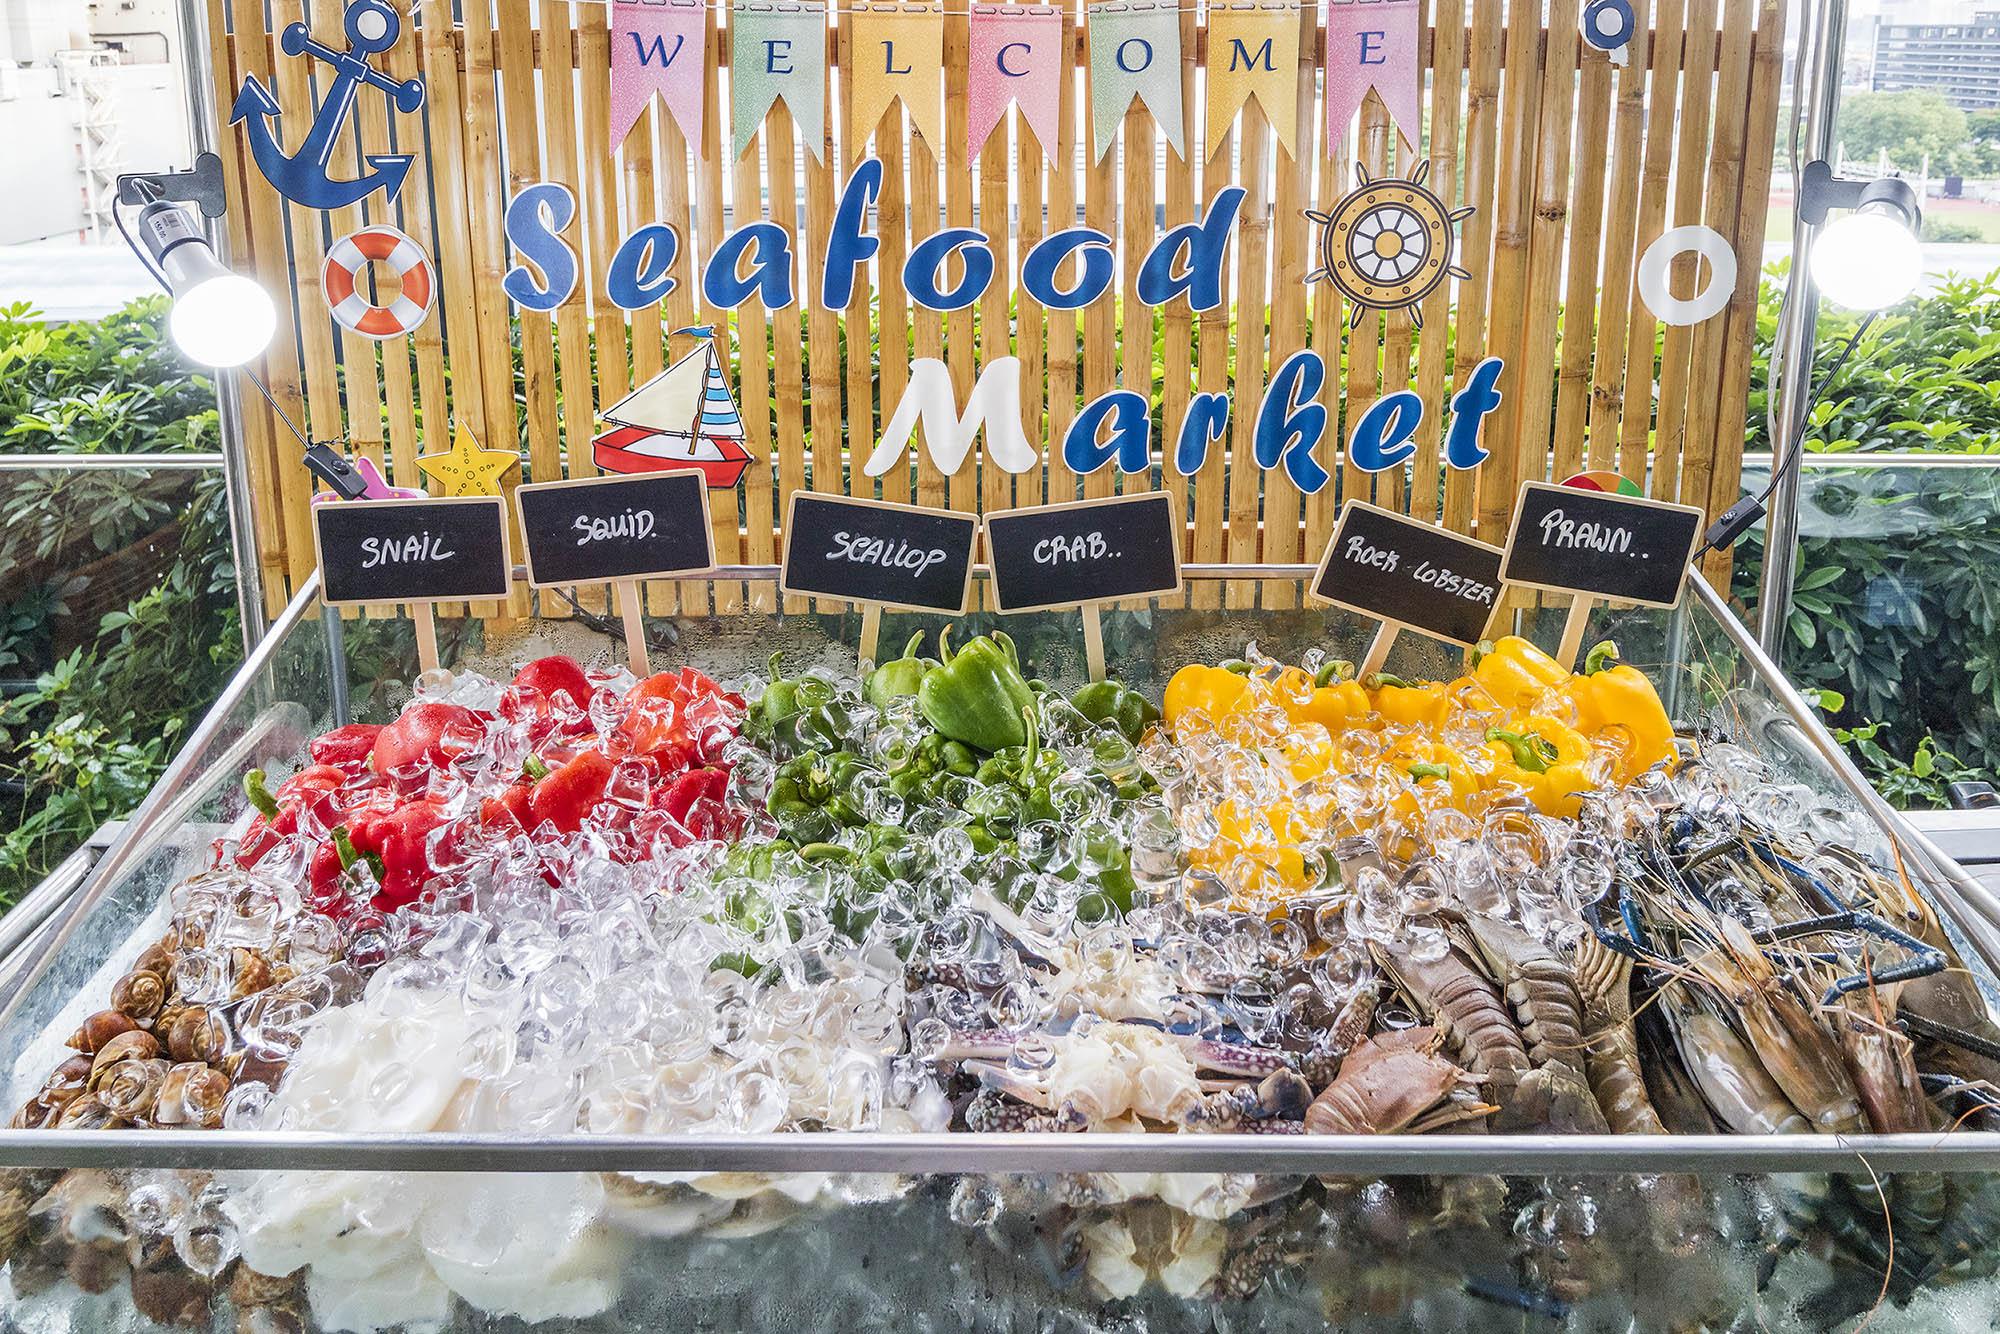 Seafood Market Buffet ห้องอาหาร The Eight โรงแรม Mercure Bangkok Siam  Seafood Market Buffet ห้องอาหาร The Eight โรงแรม Mercure Bangkok Siam IMG 0053